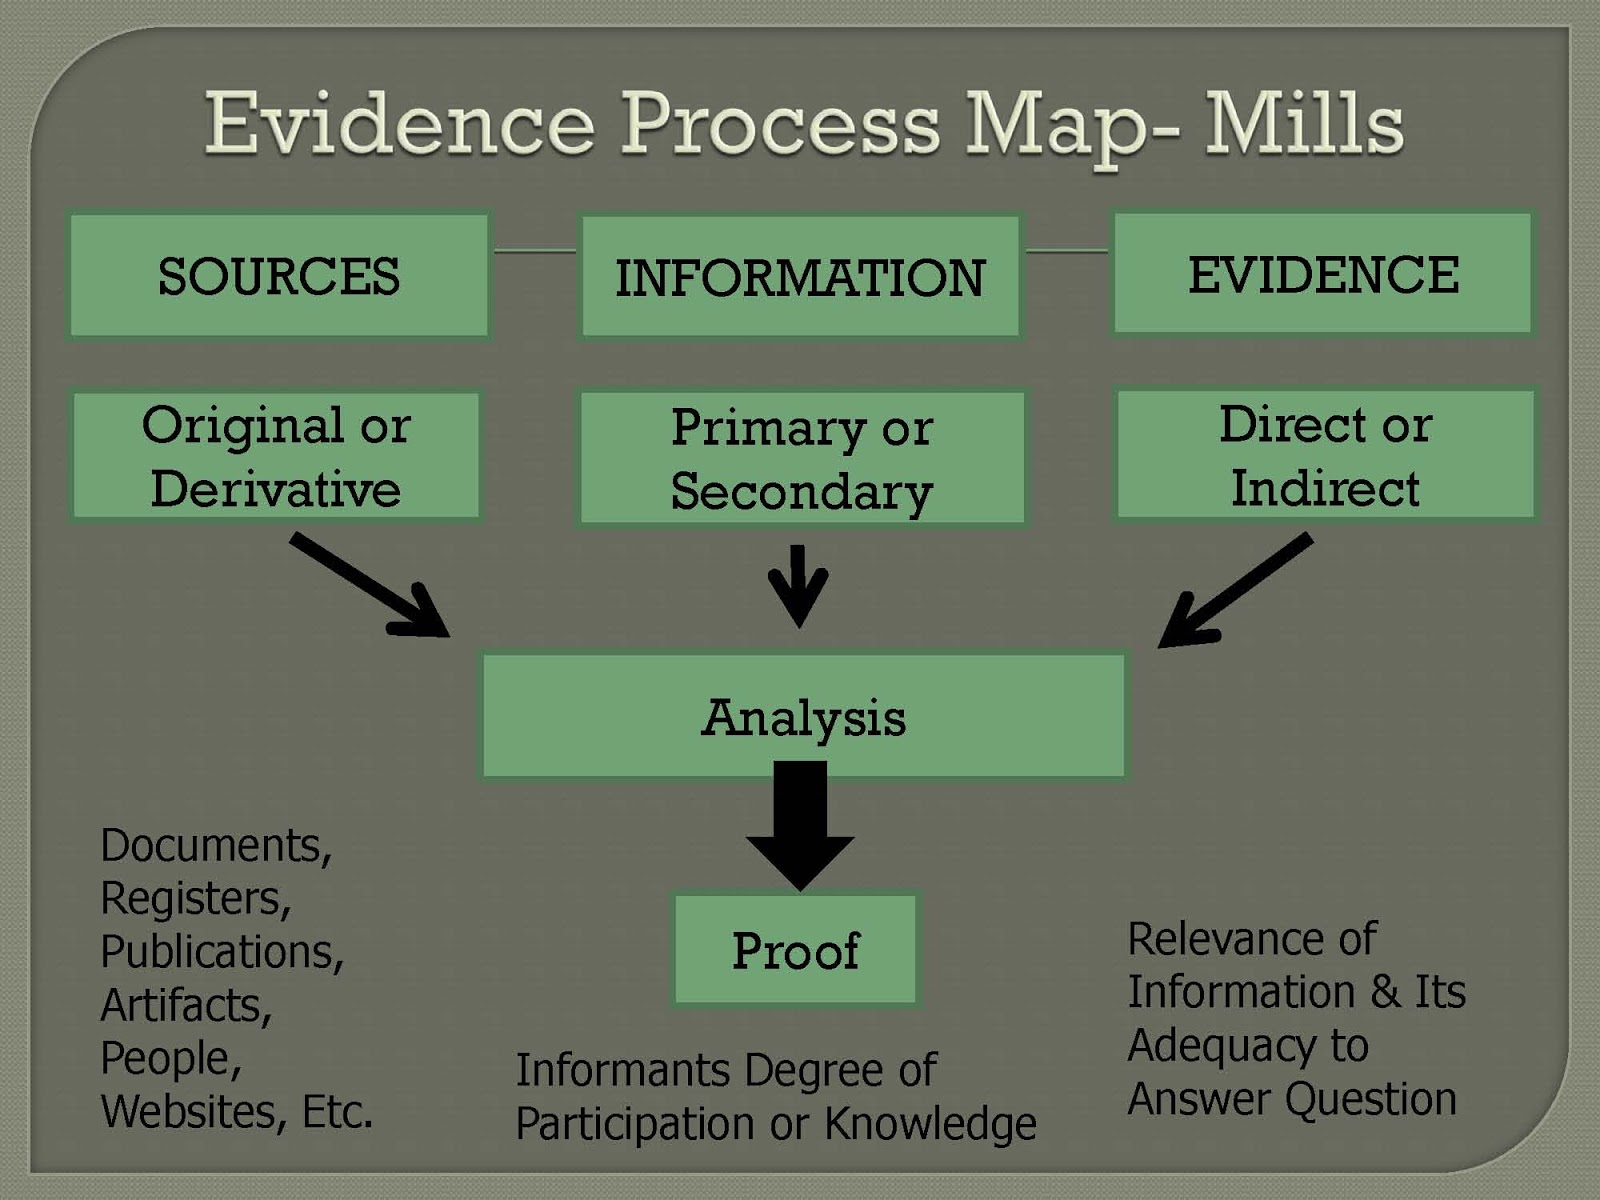 Evidence Process Map- Elizabeth Shown Mills